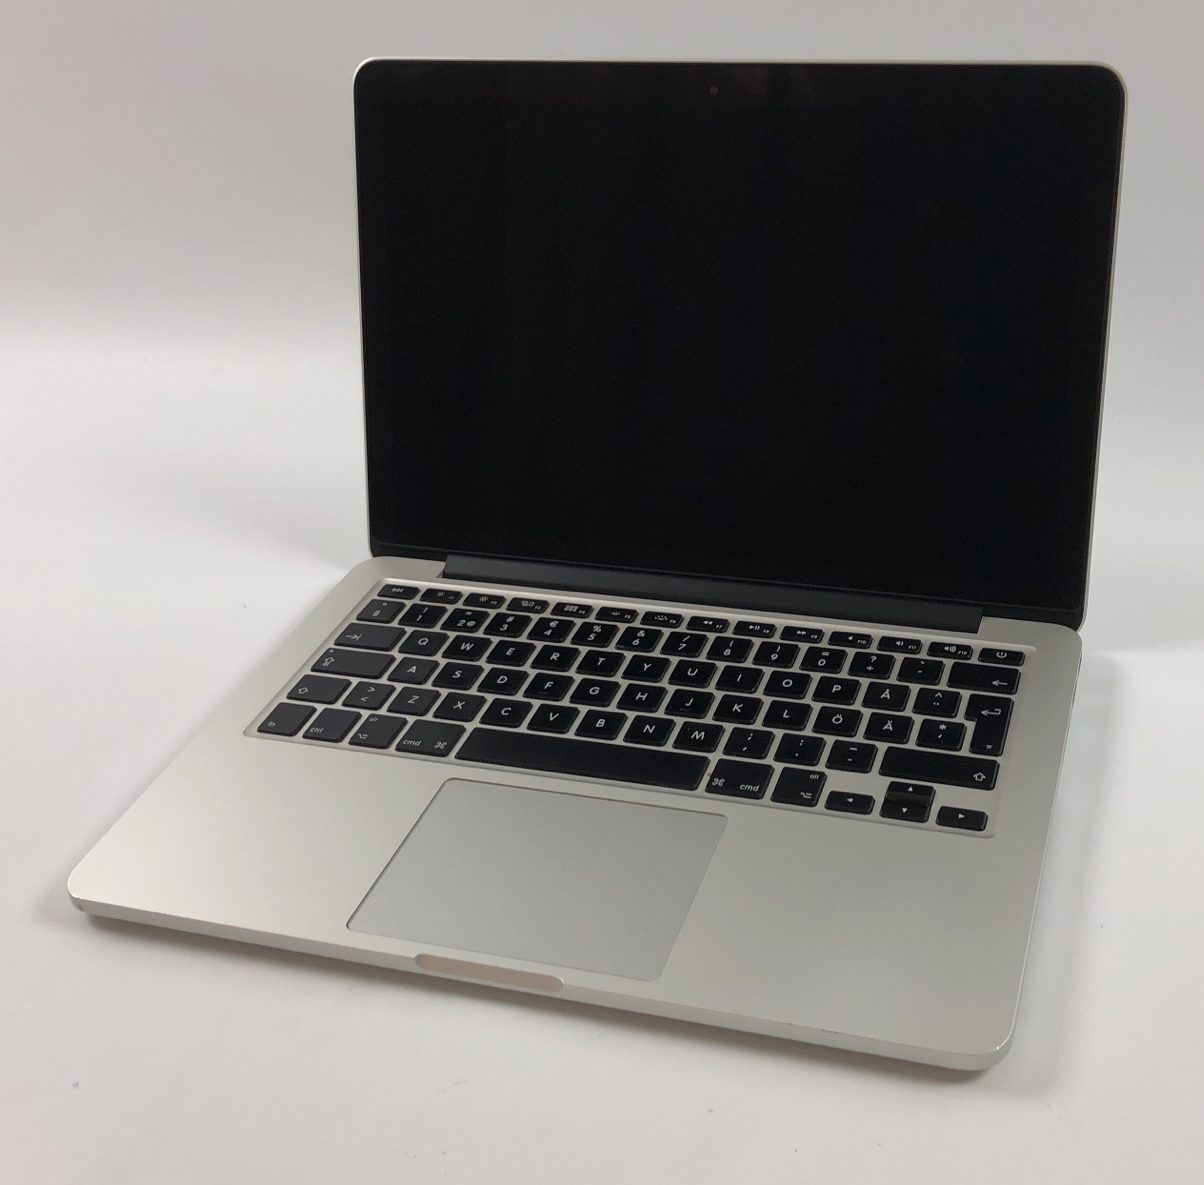 "MacBook Pro Retina 13"" Mid 2014 (Intel Core i5 2.8 GHz 16 GB RAM 512 GB SSD), Intel Core i5 2.8 GHz, 16 GB RAM, 512 GB SSD, bild 1"